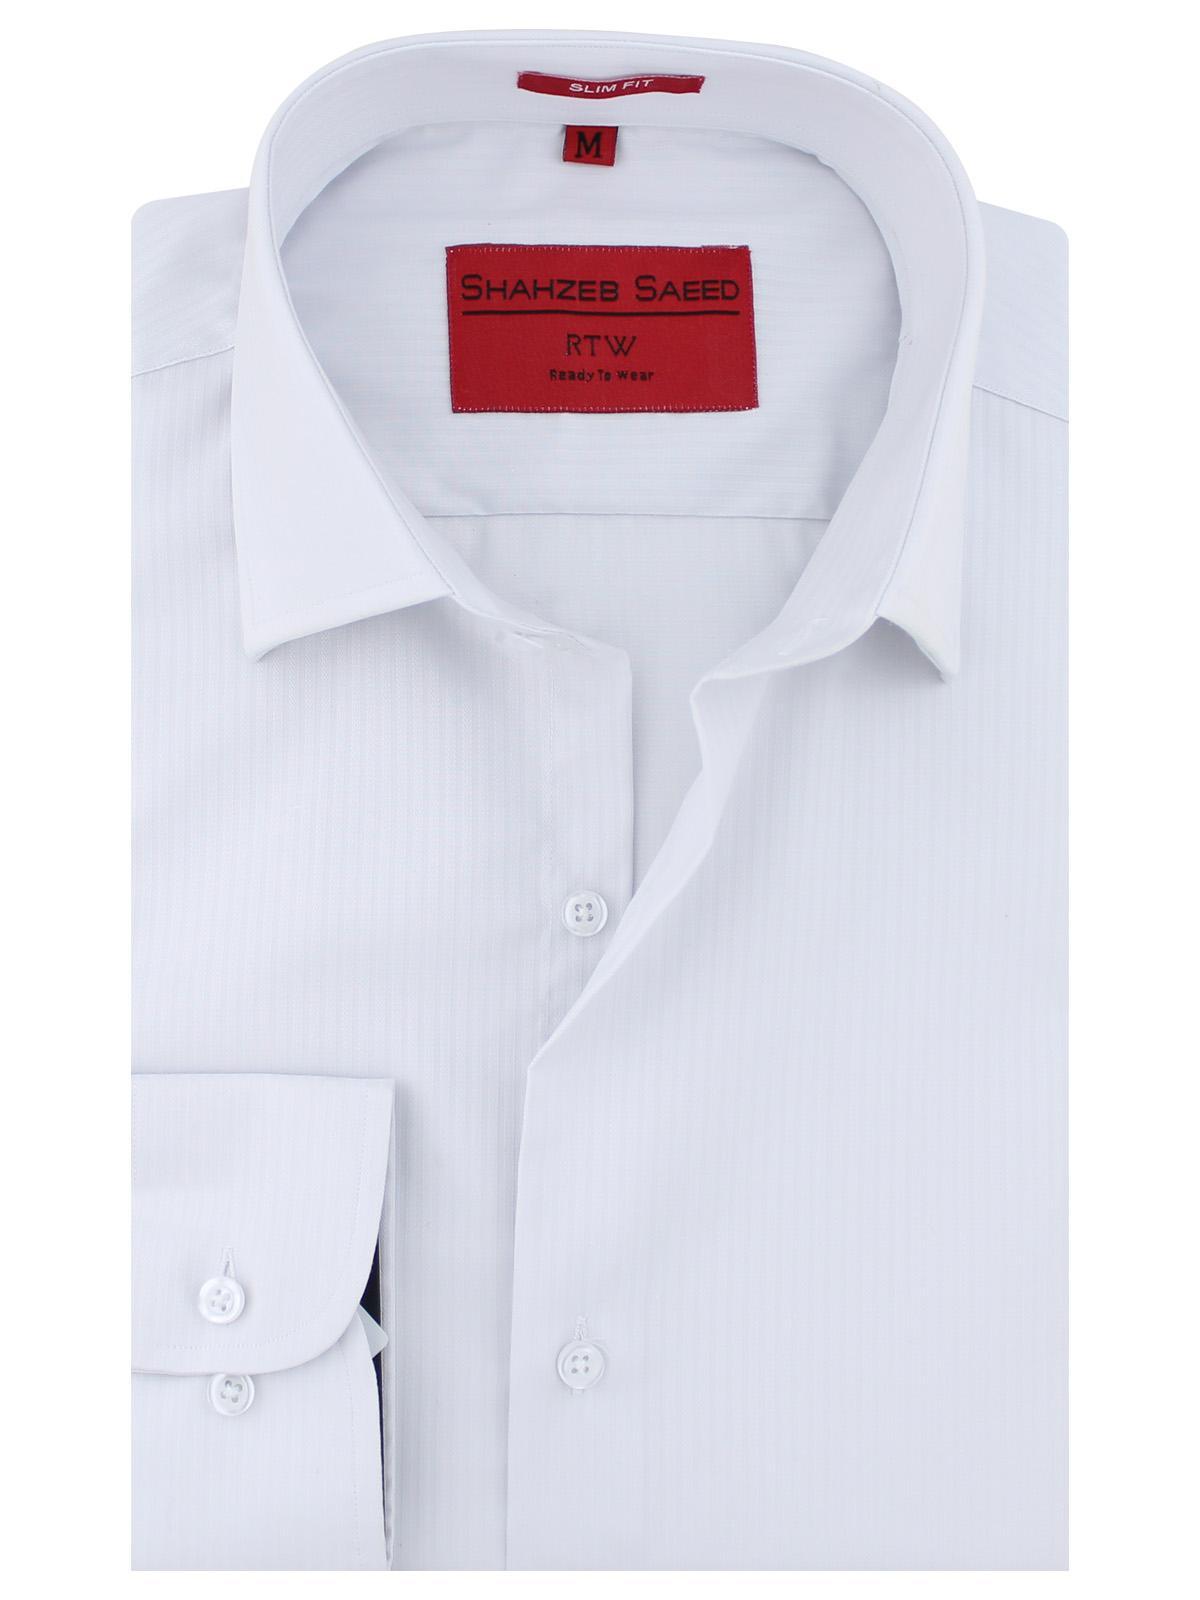 Shahzeb Saeed White Self Fabric Slim Fit Formal Shirt For Men